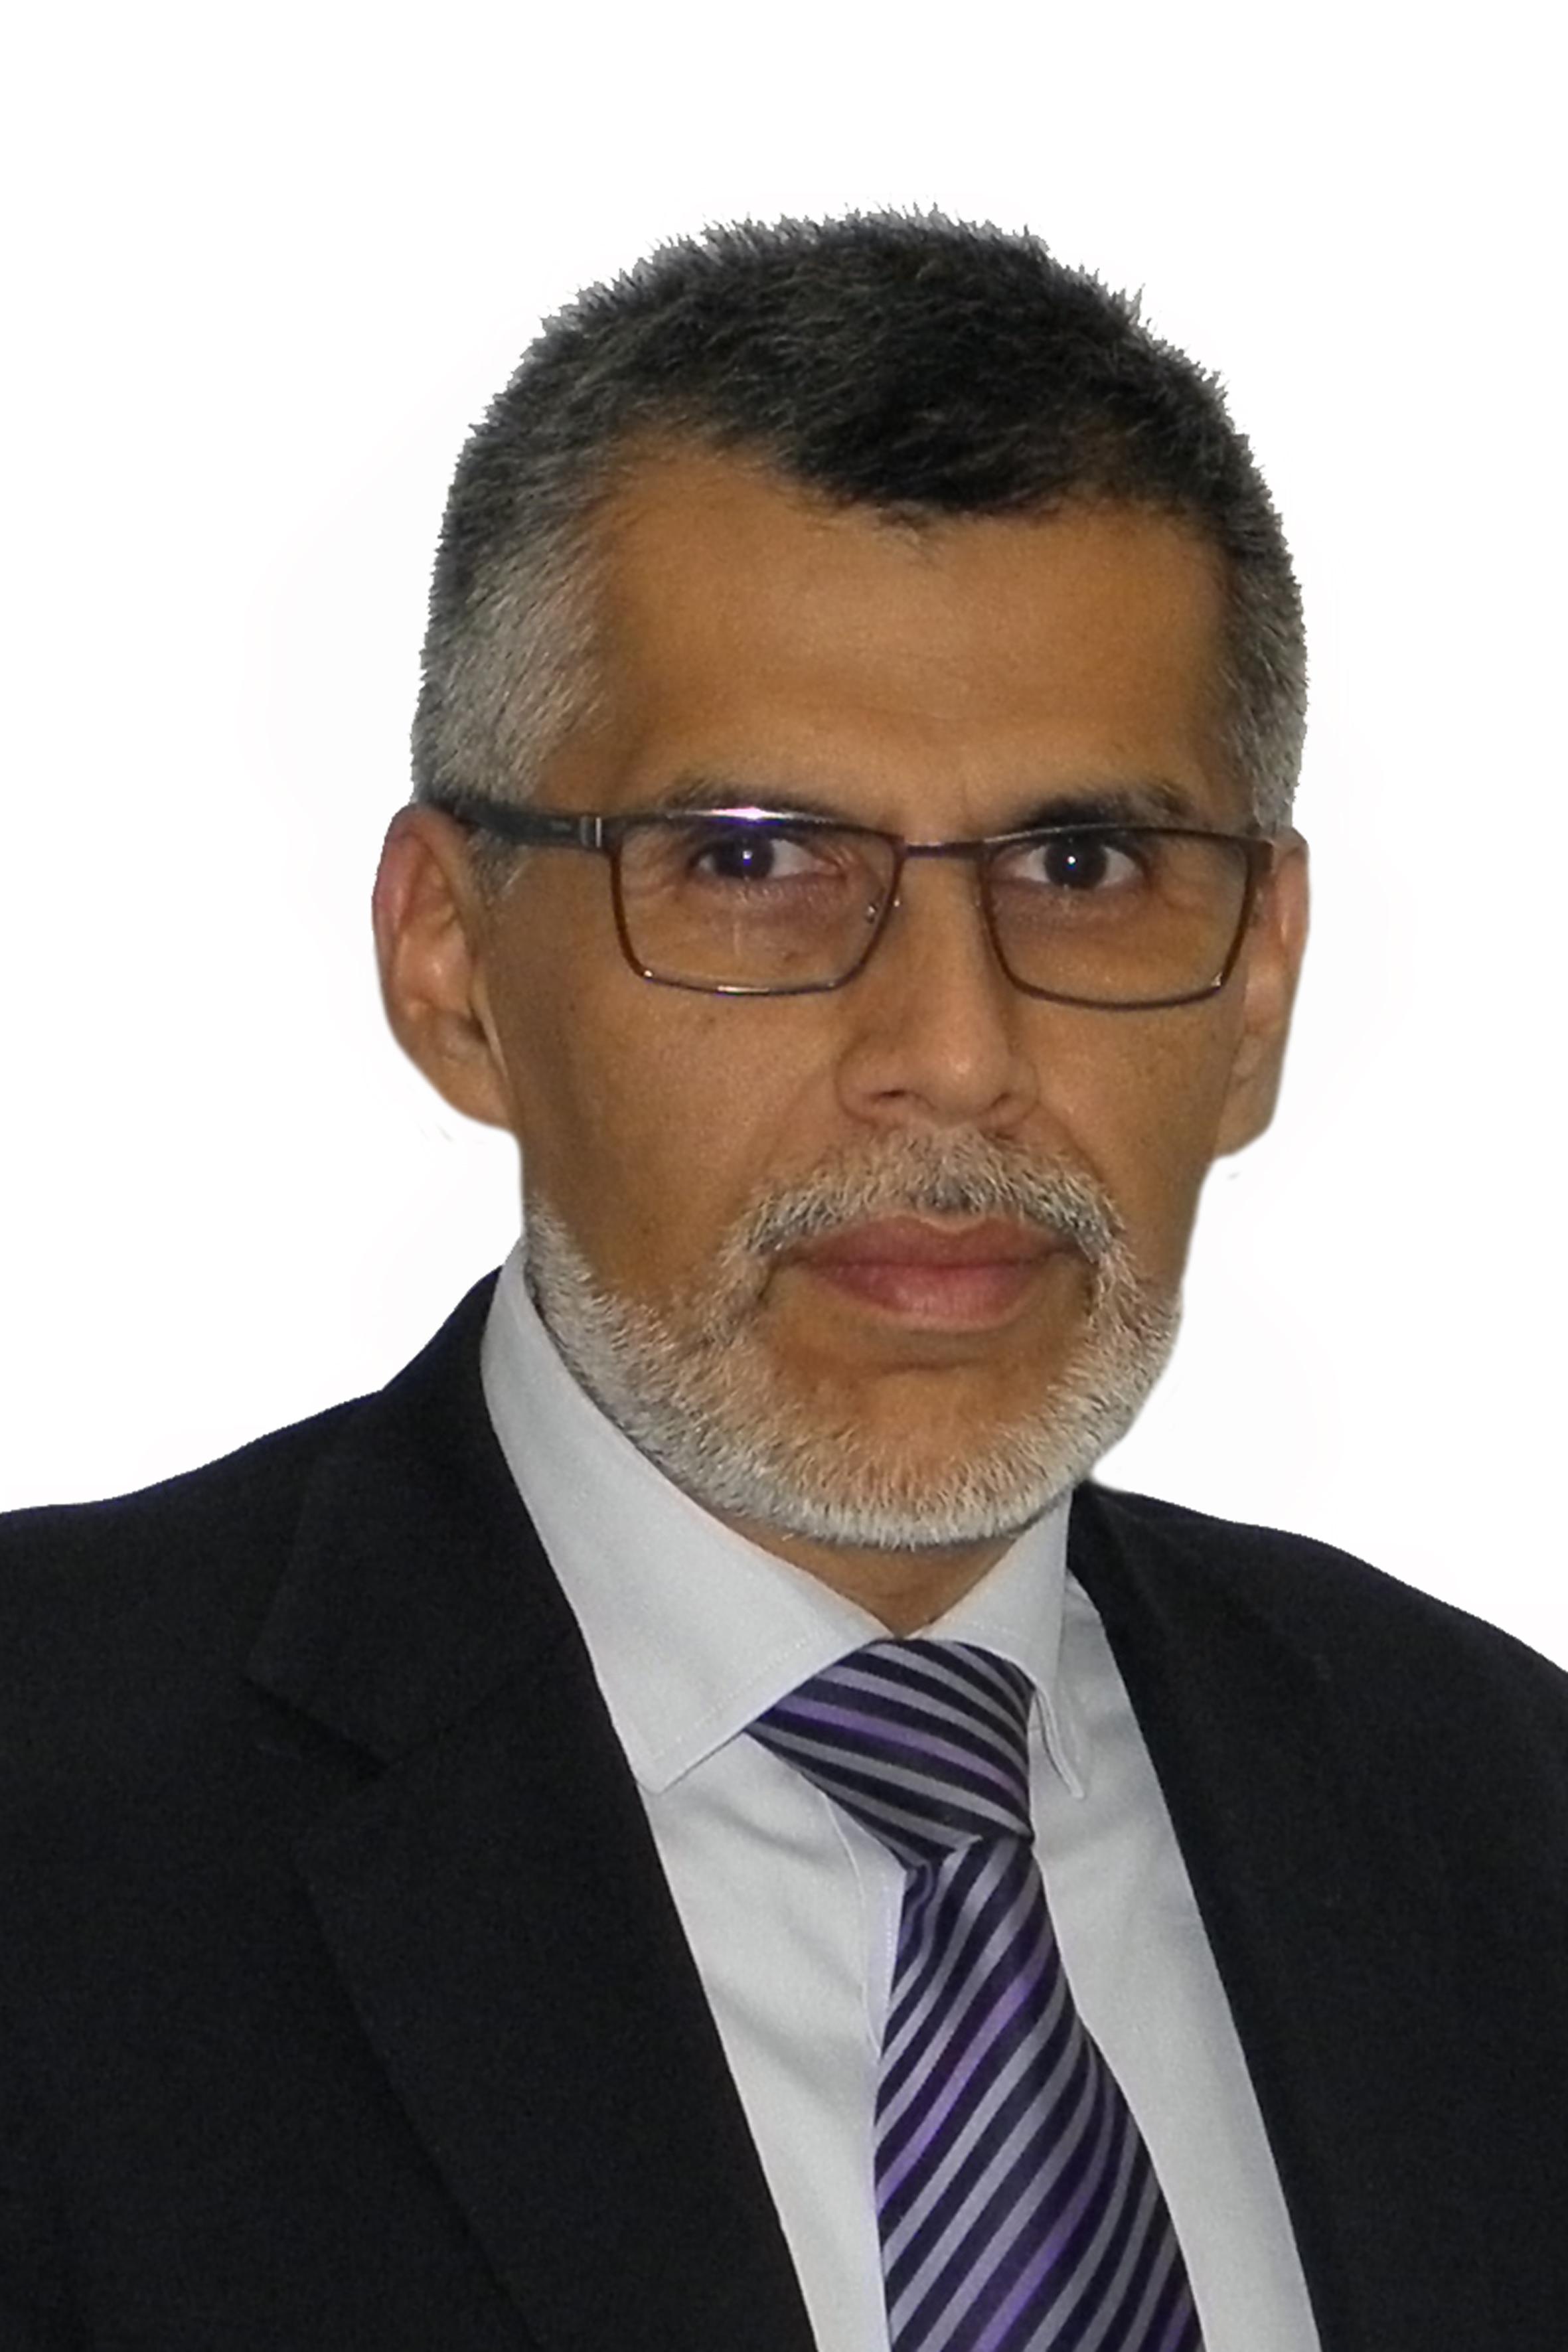 Roberto Melendez